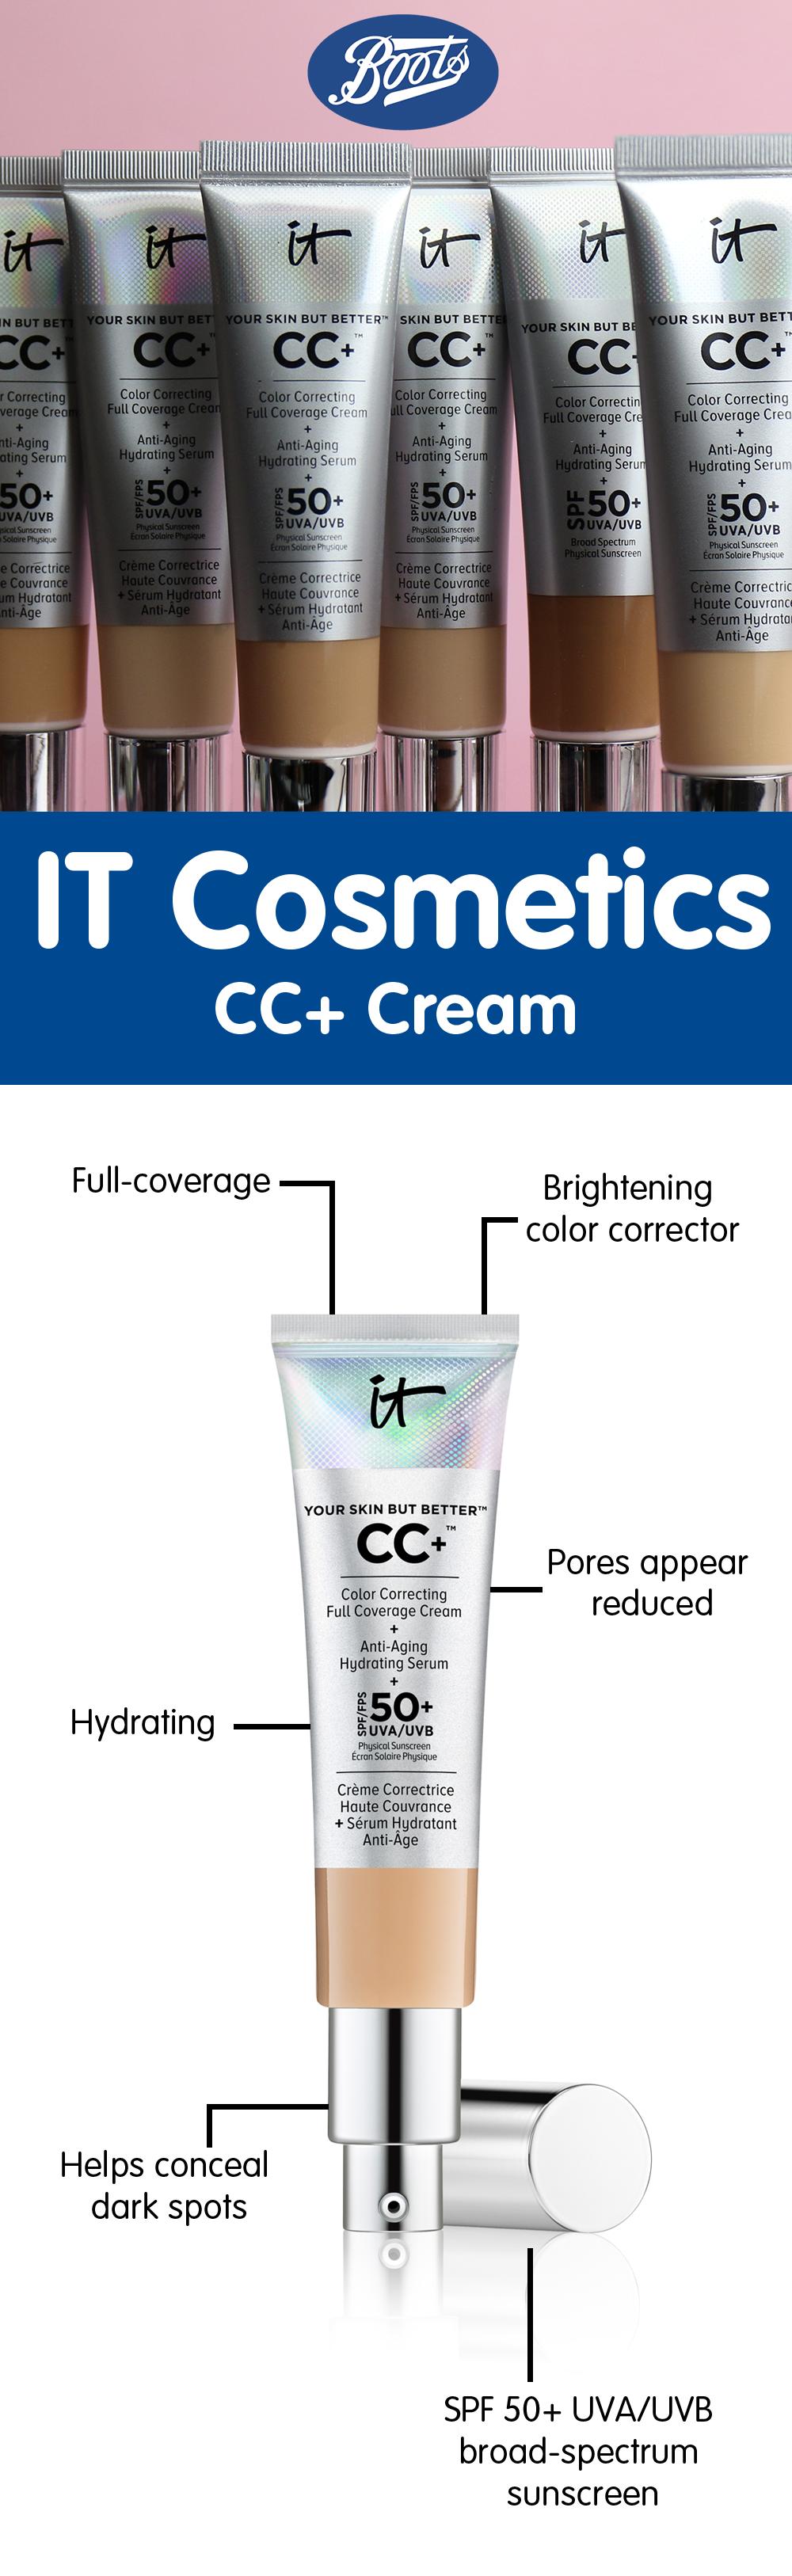 IT Cosmetics CC+ Cream It cosmetics cc cream, Spf 50